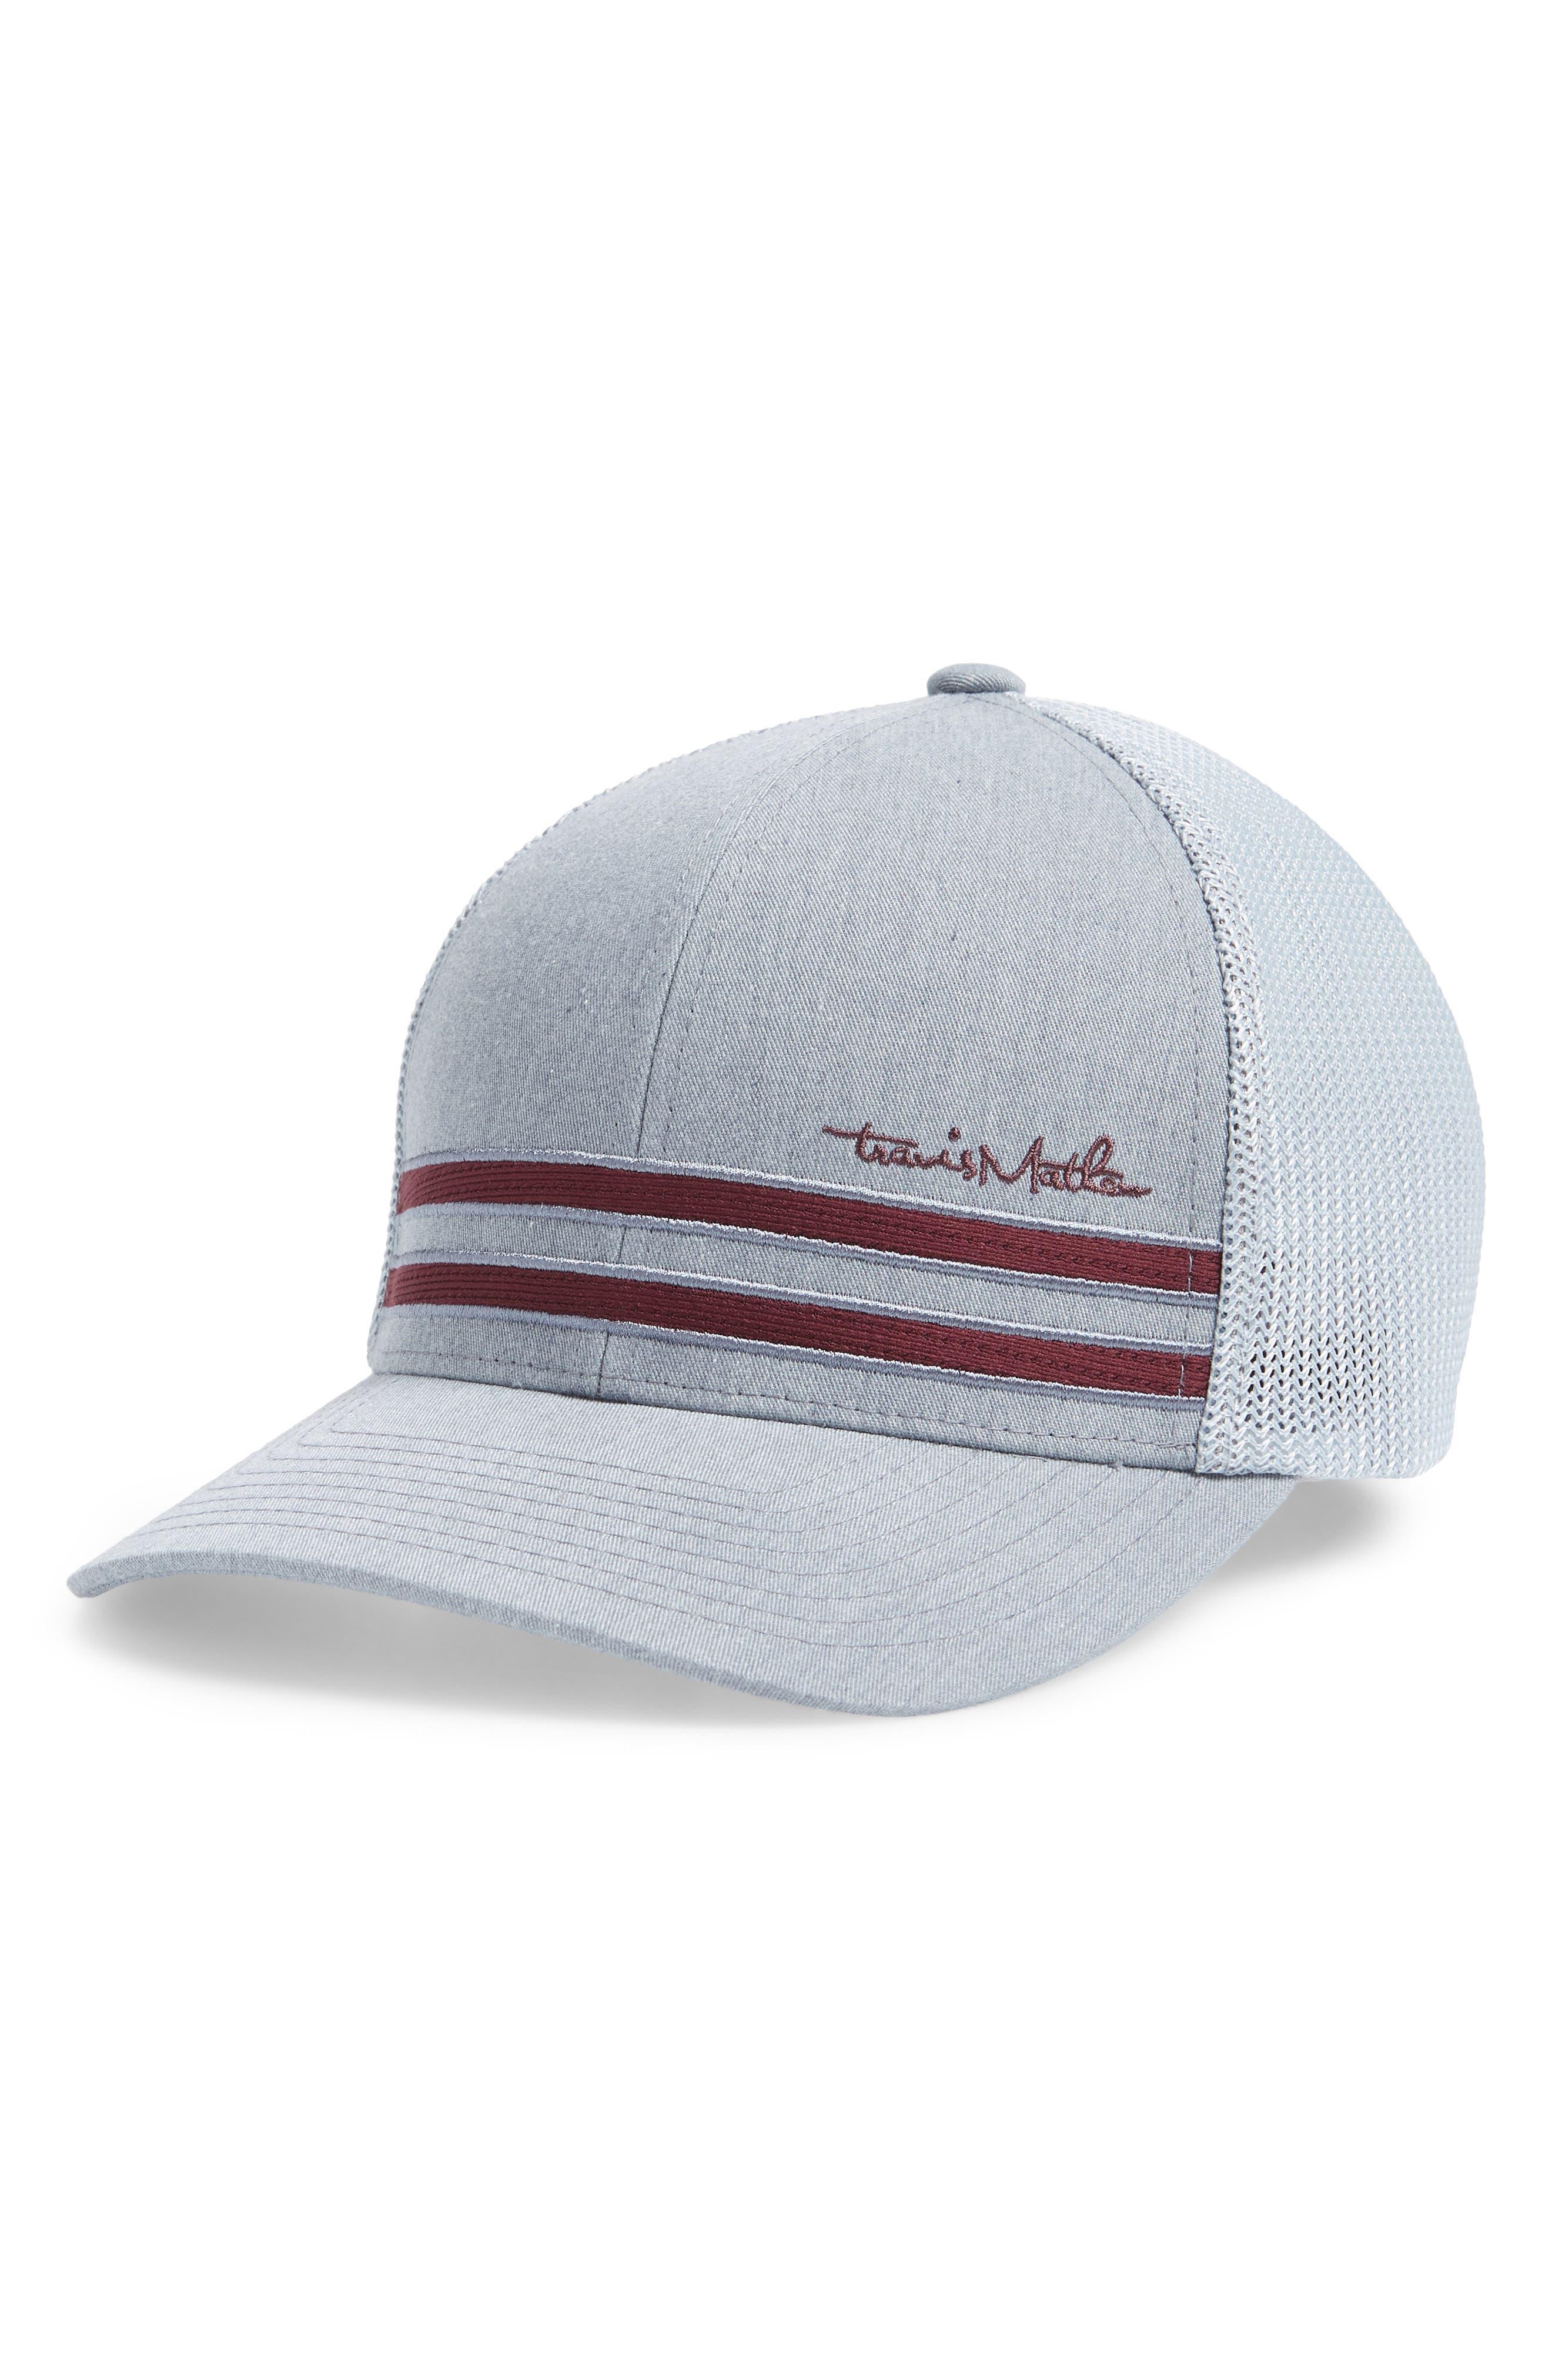 Swammy Mesh Ball Cap,                         Main,                         color, HEATHER GREY